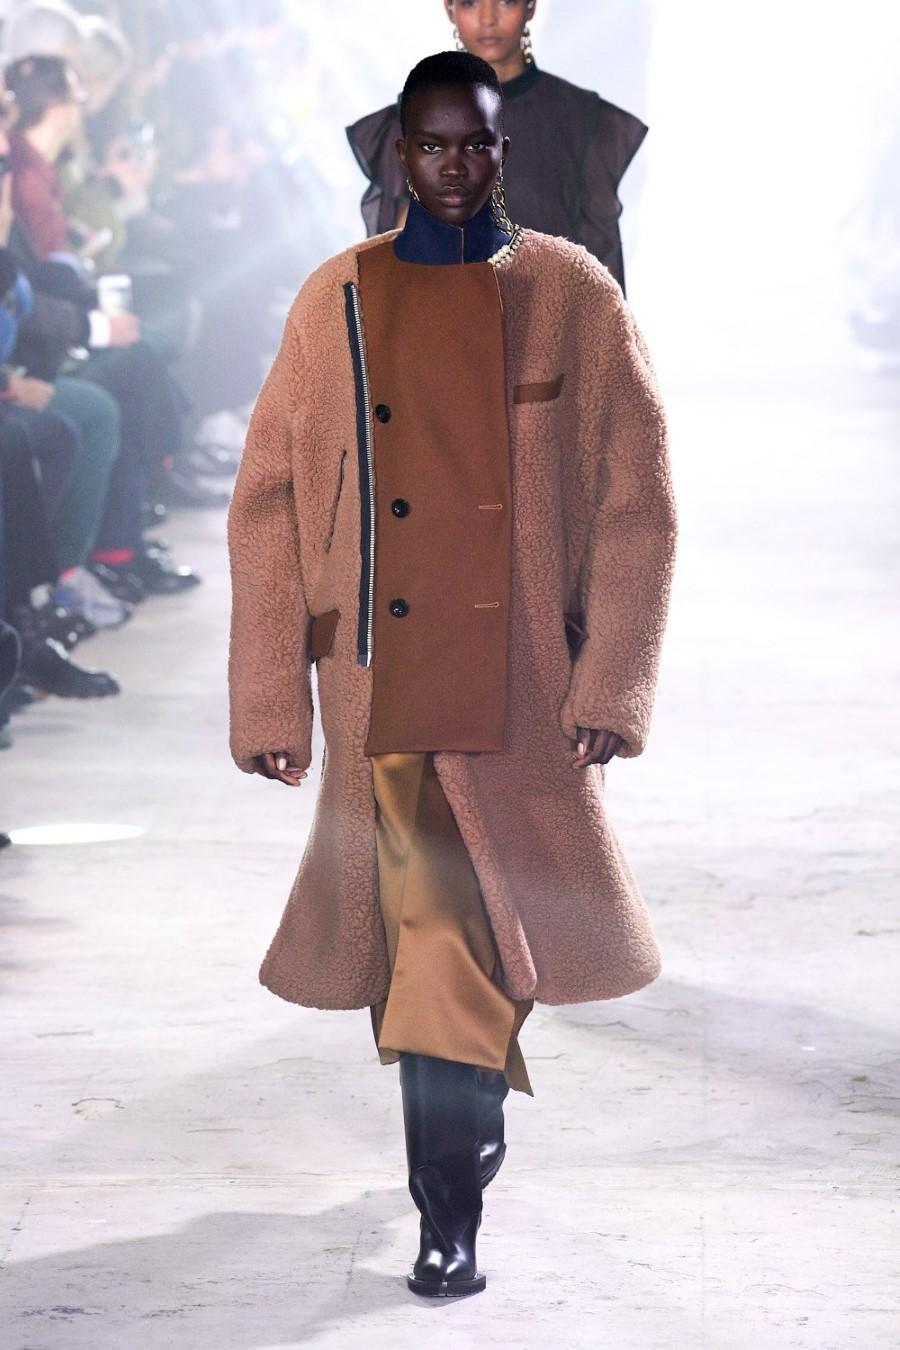 Sacai - Fall Winter 2020 - Paris Fashion WeekSacai - Fall Winter 2020 - Paris Fashion Week